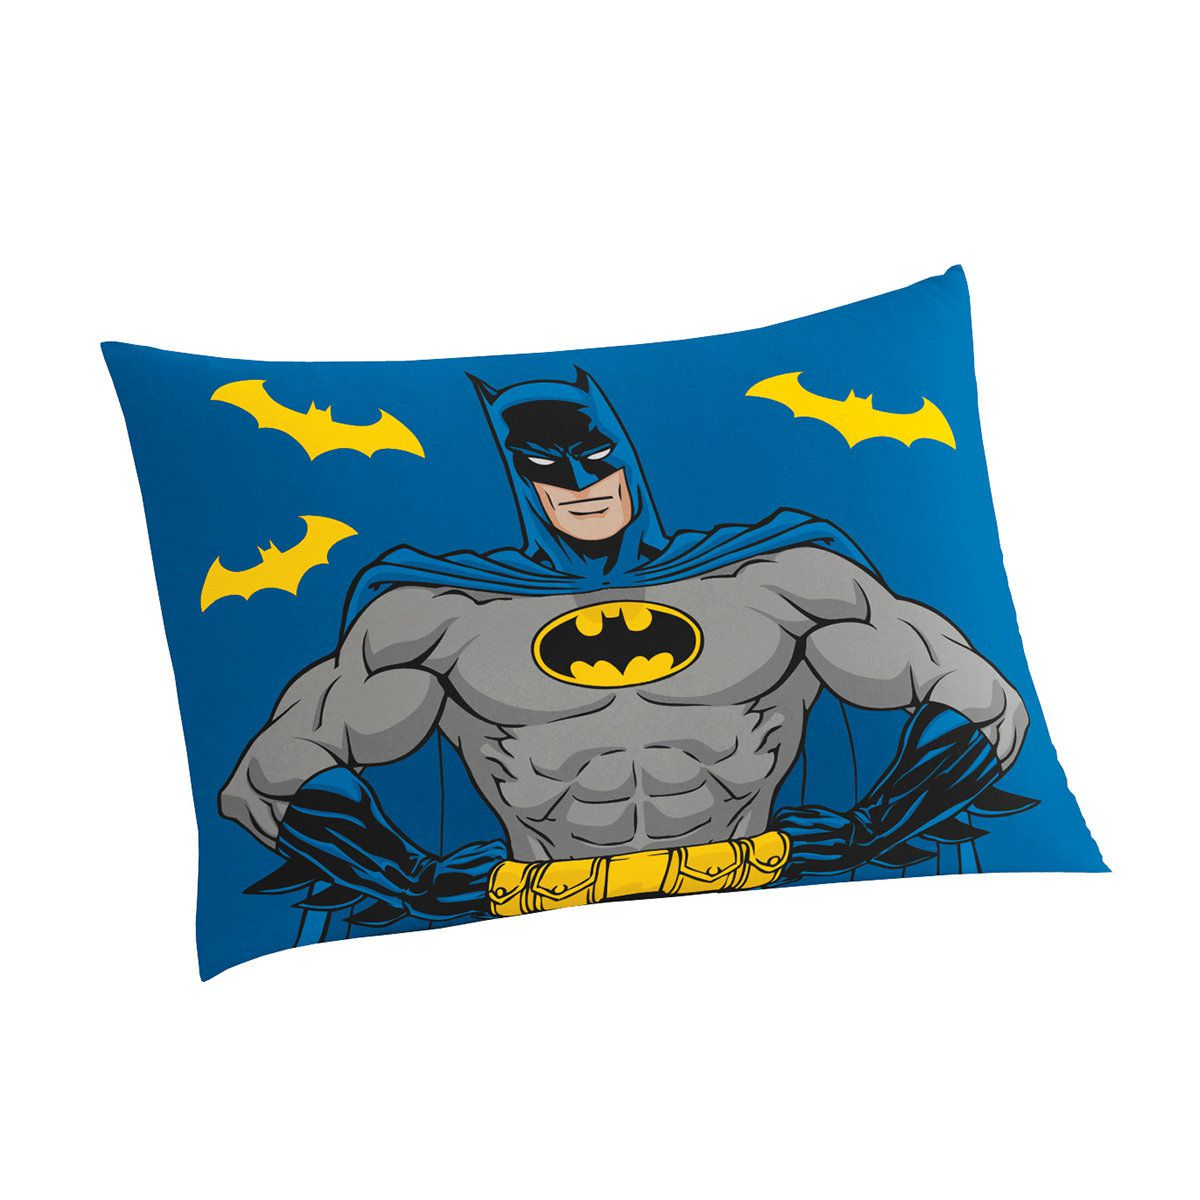 Jogo De Lençol Infantil Batman 02 Peças 1,50x2,10m Lepper